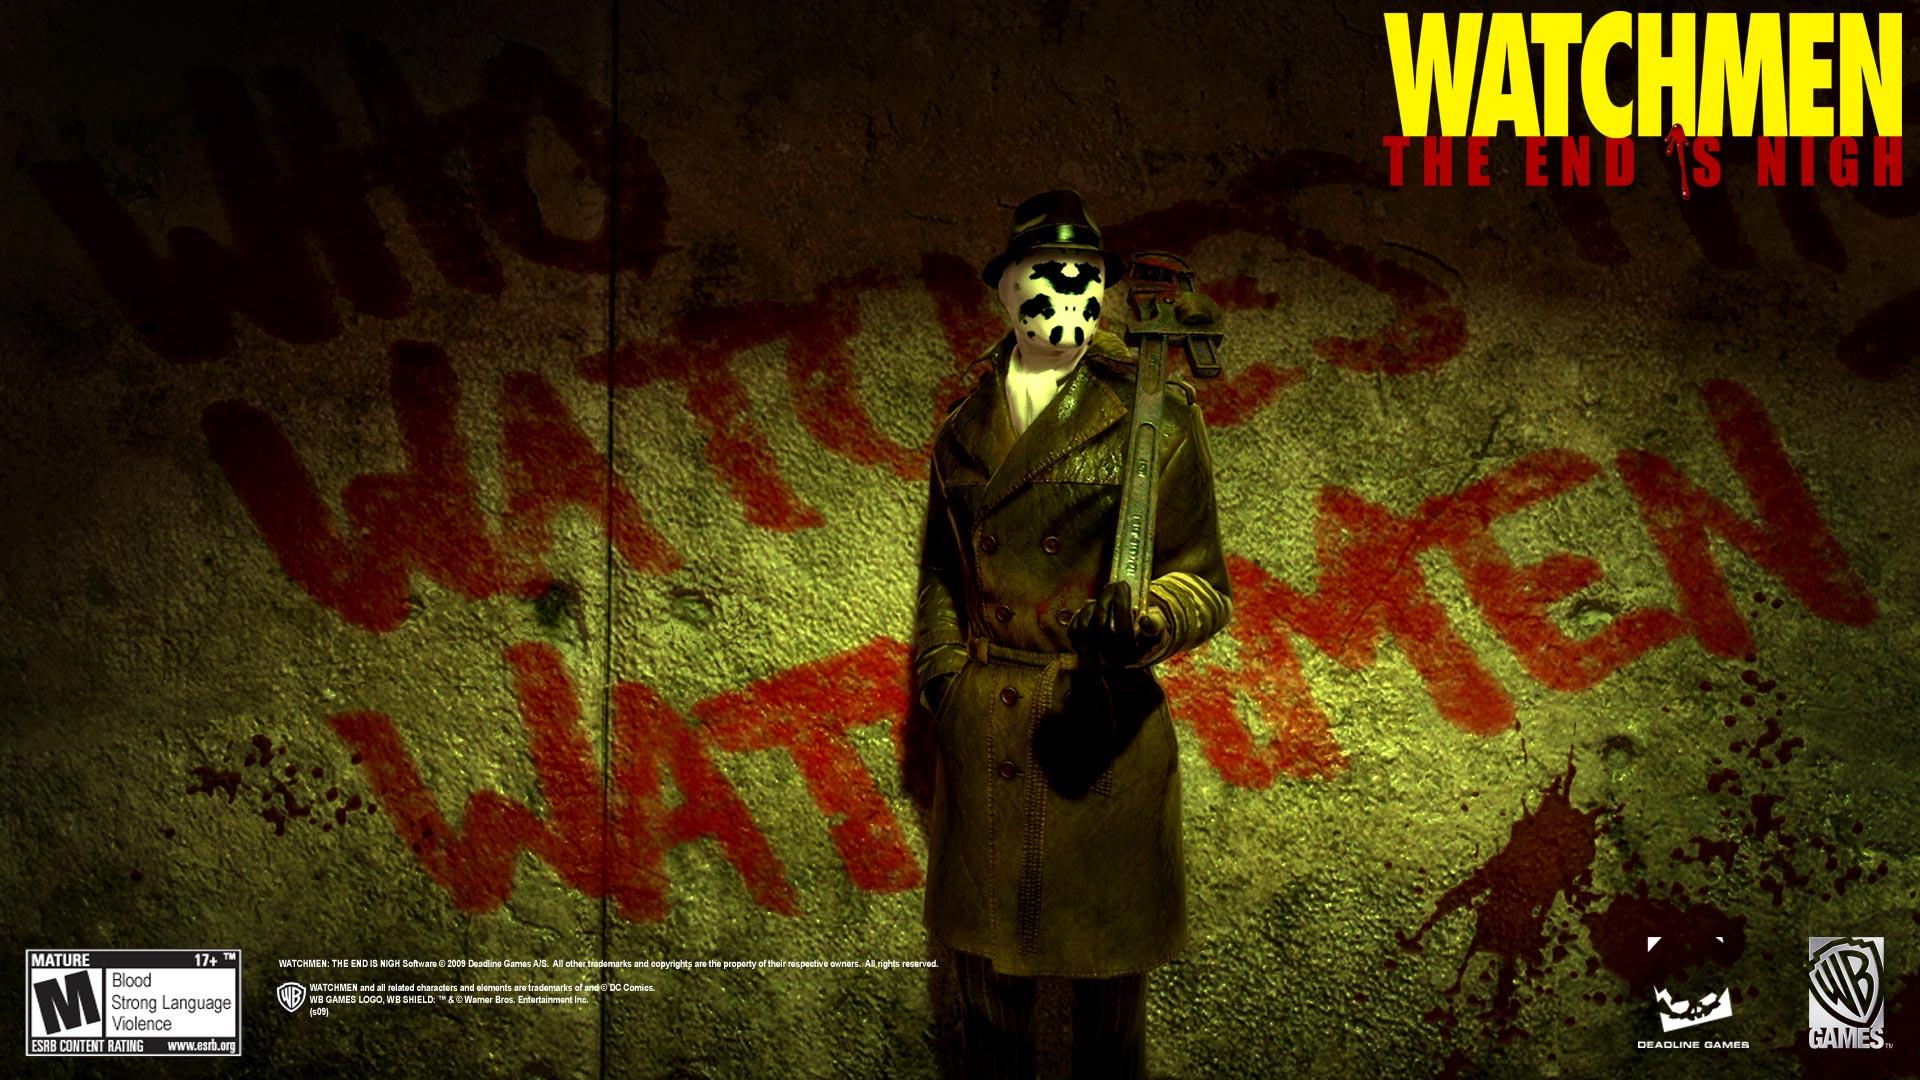 watchmen iphone wallpaper   wwwhigh definition wallpapercom 1920x1080